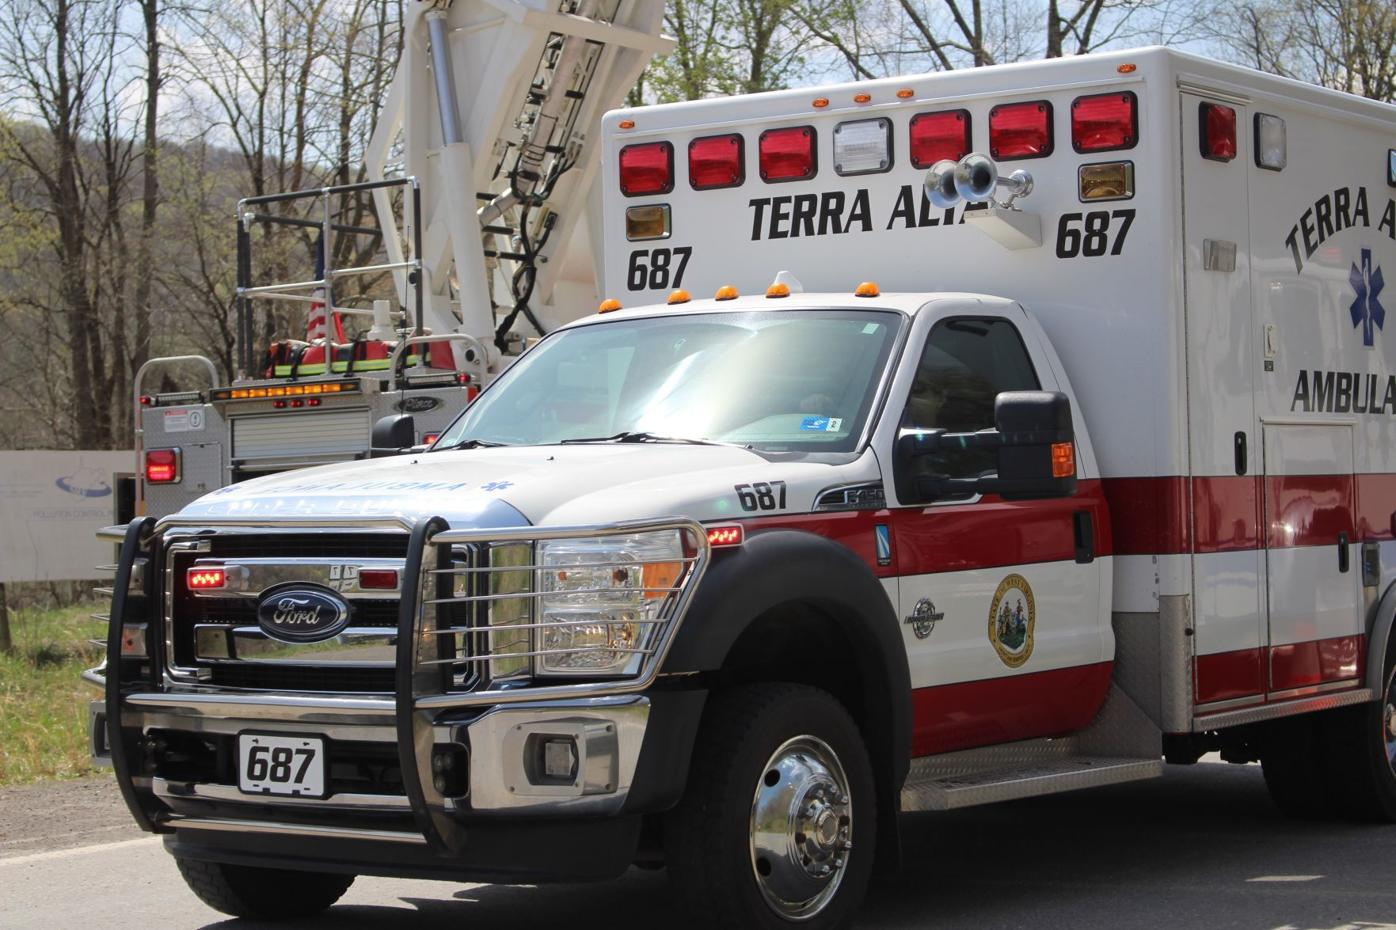 Terra Alta Ambulance